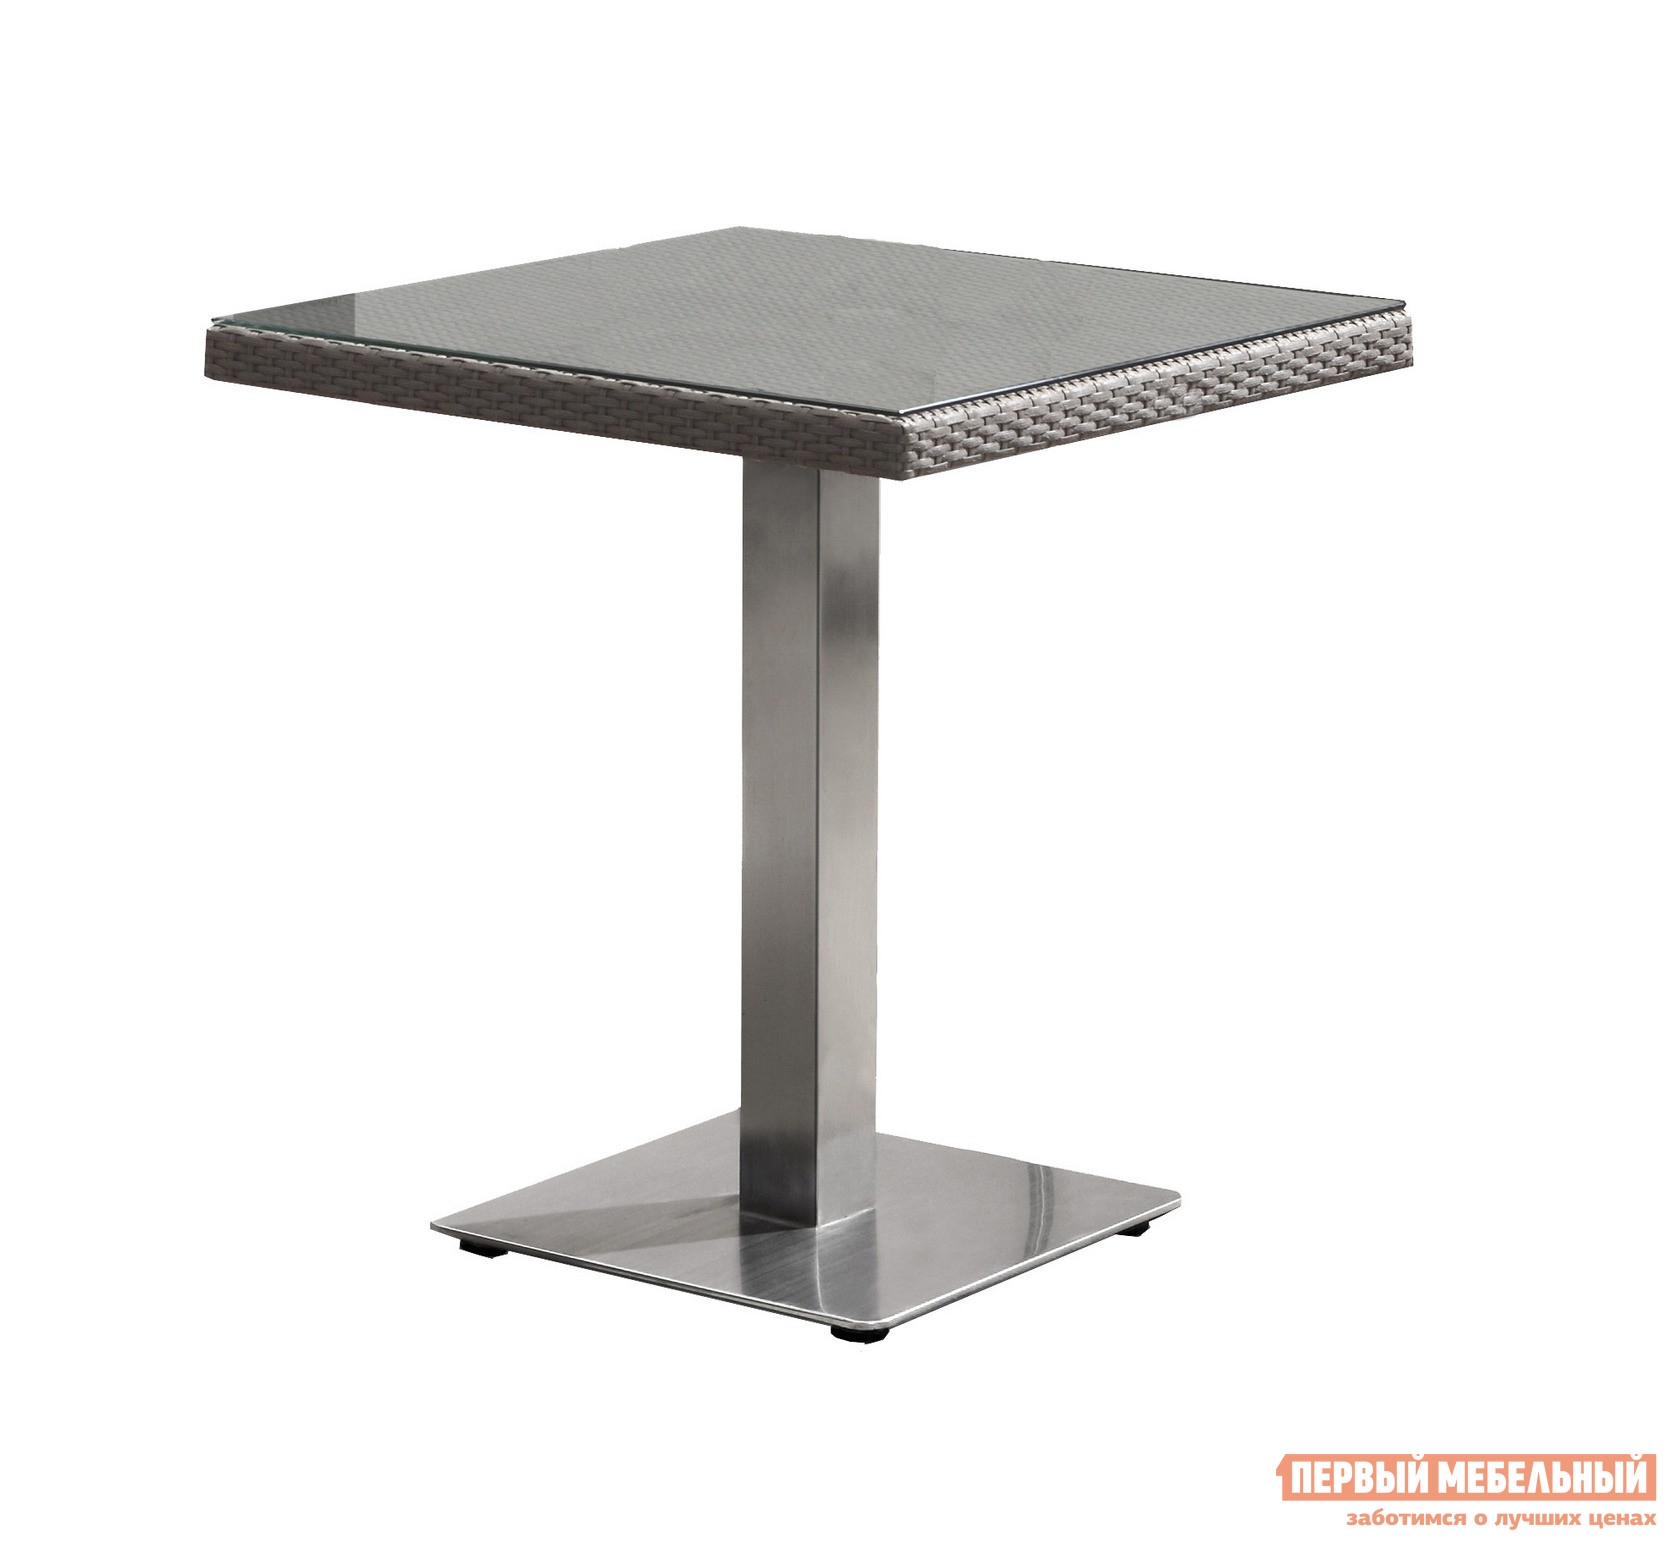 Плетеный стол Кватросис Компания 805273 плетеный стол кватросис бергамо yh s4684p 2